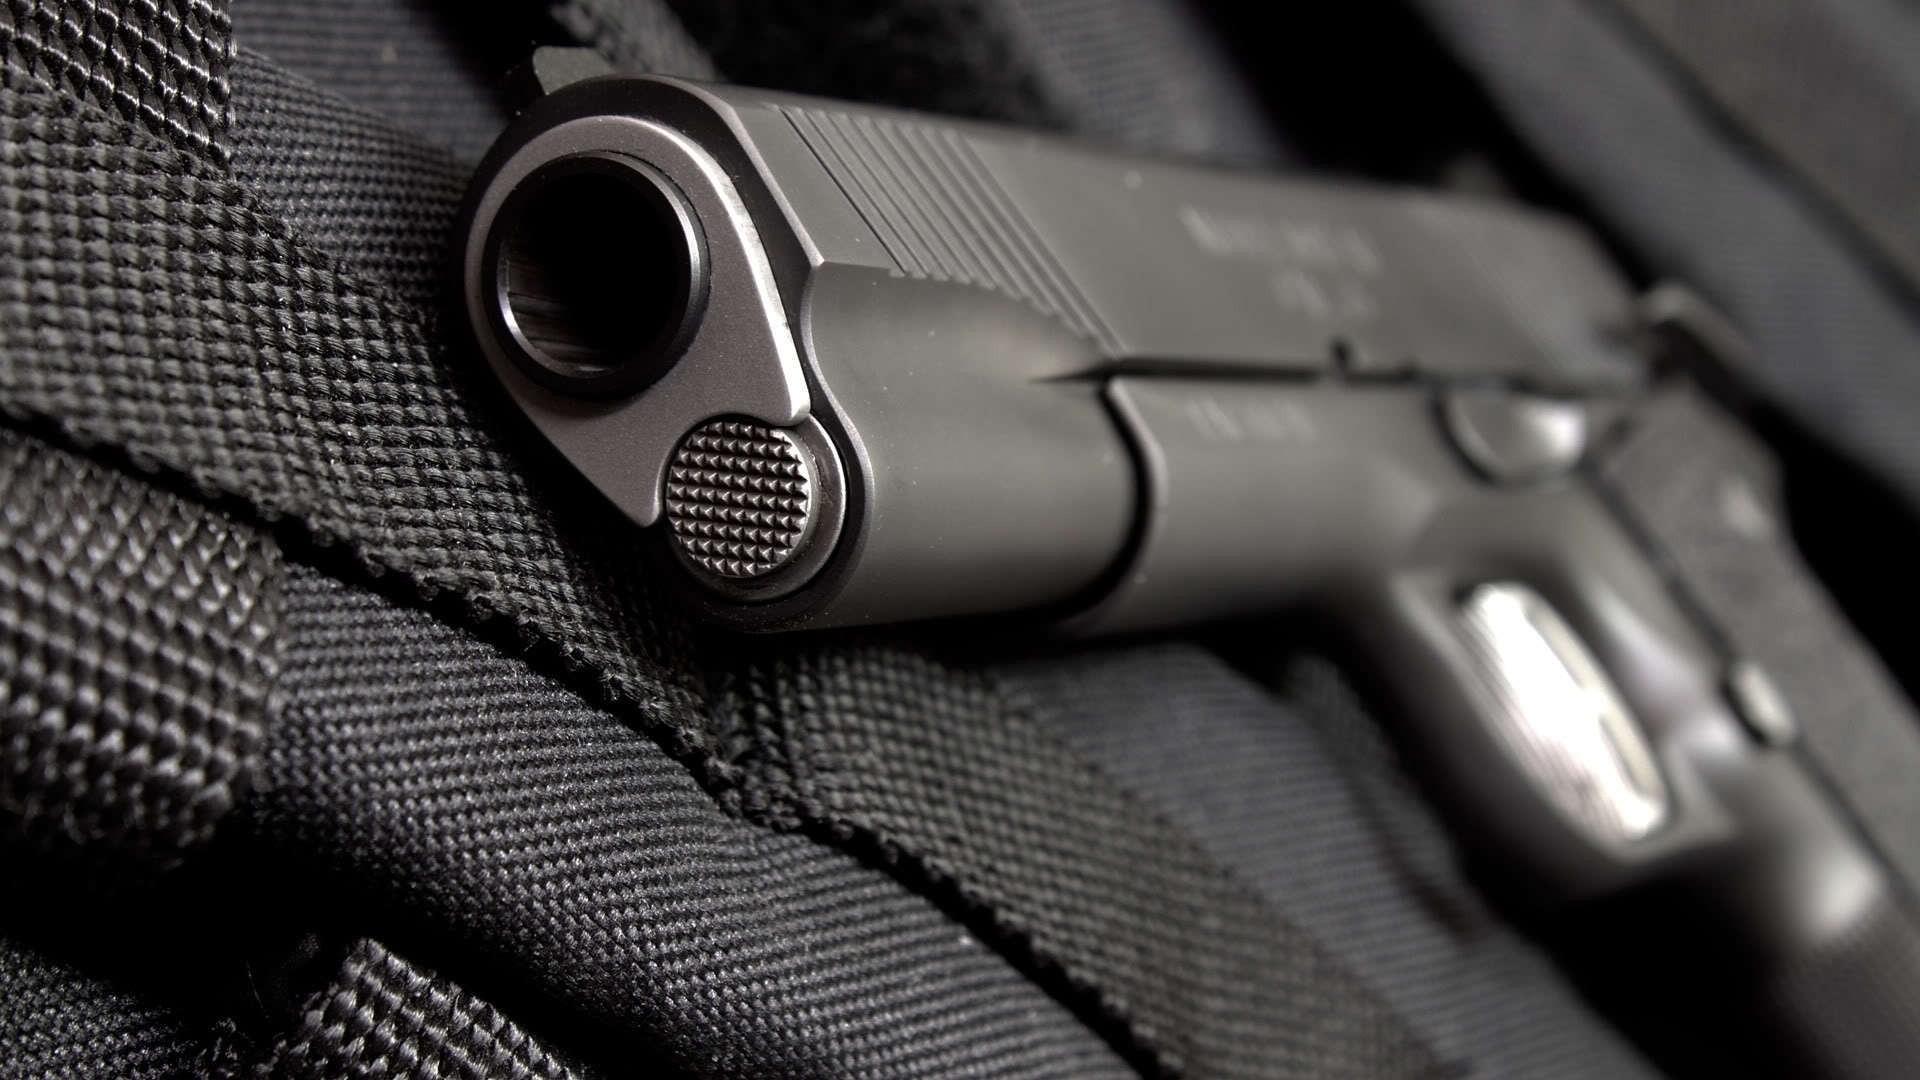 2500x1875 Glock 17 Gen 4 Wallpapers Hq